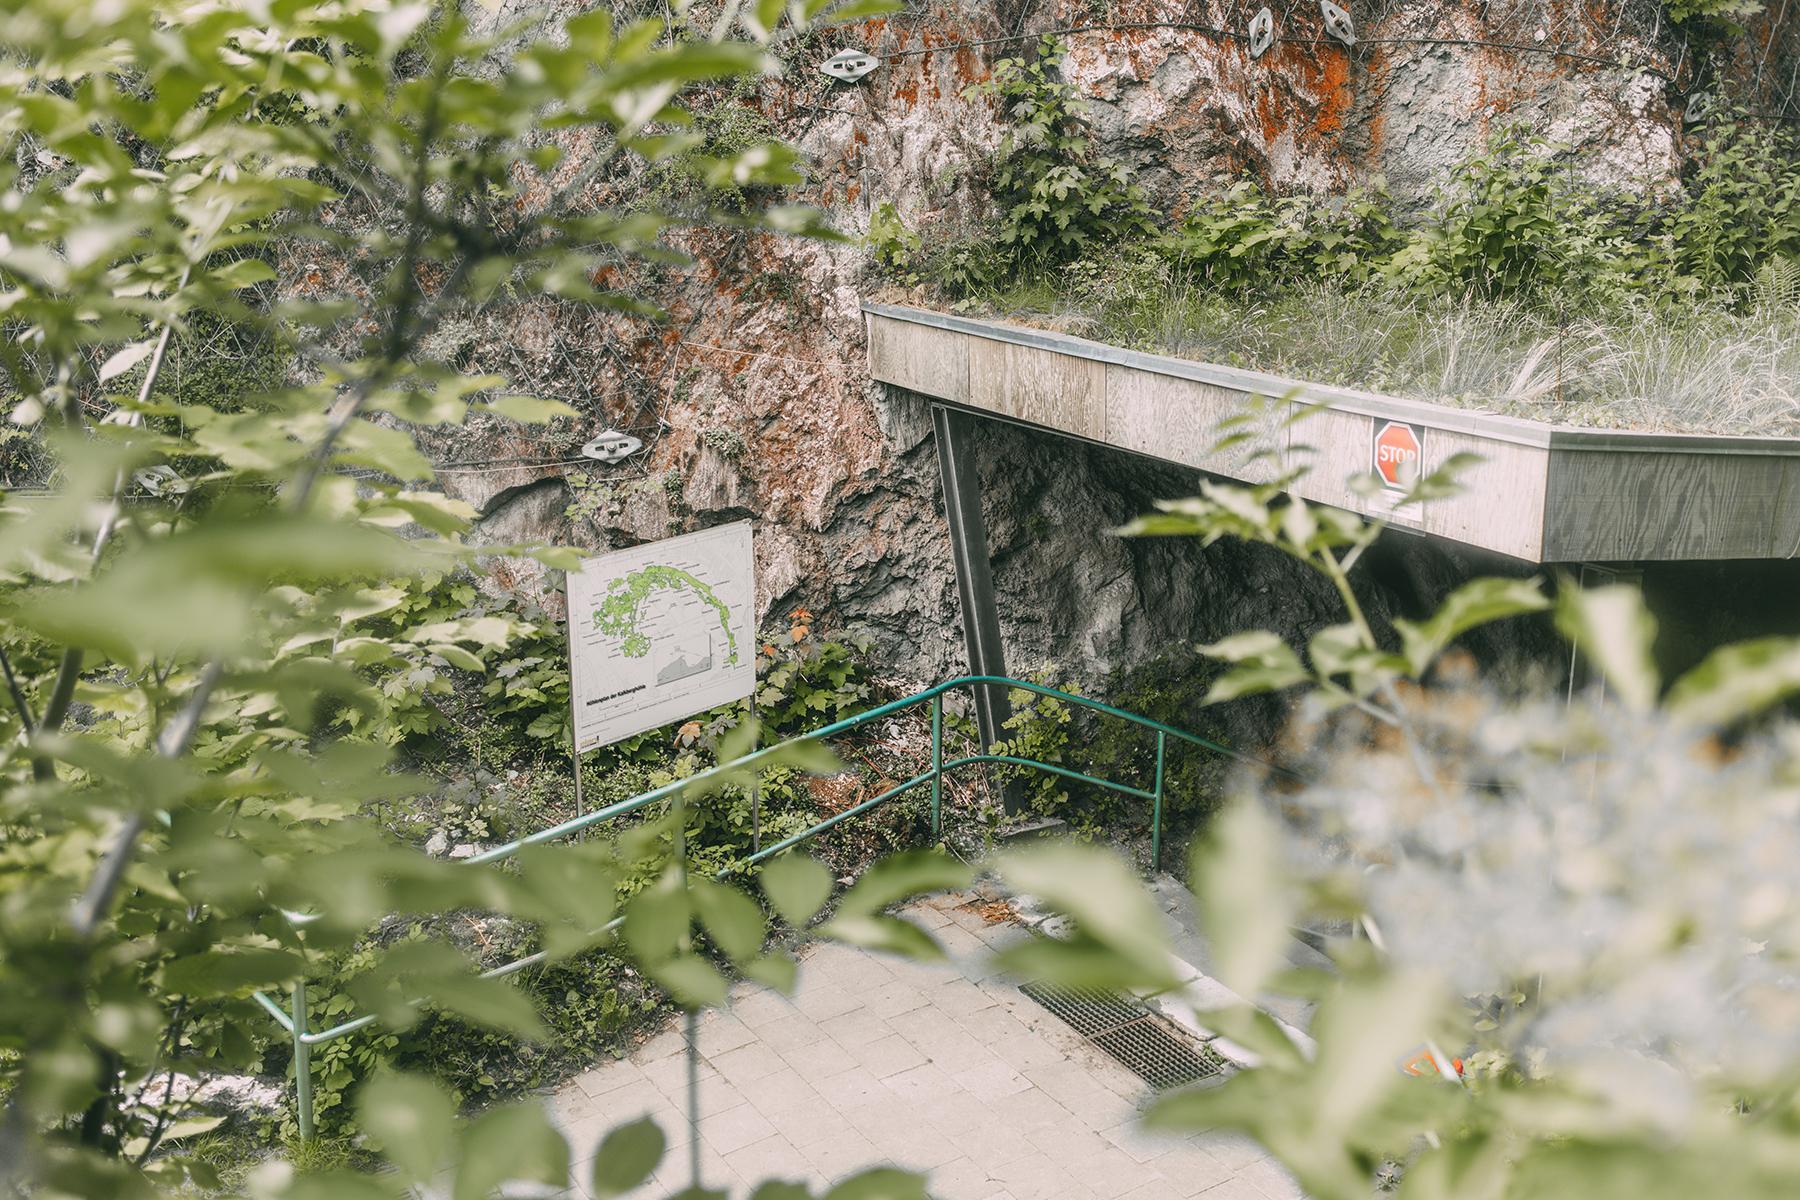 Höhleneingang Bad Segeberg